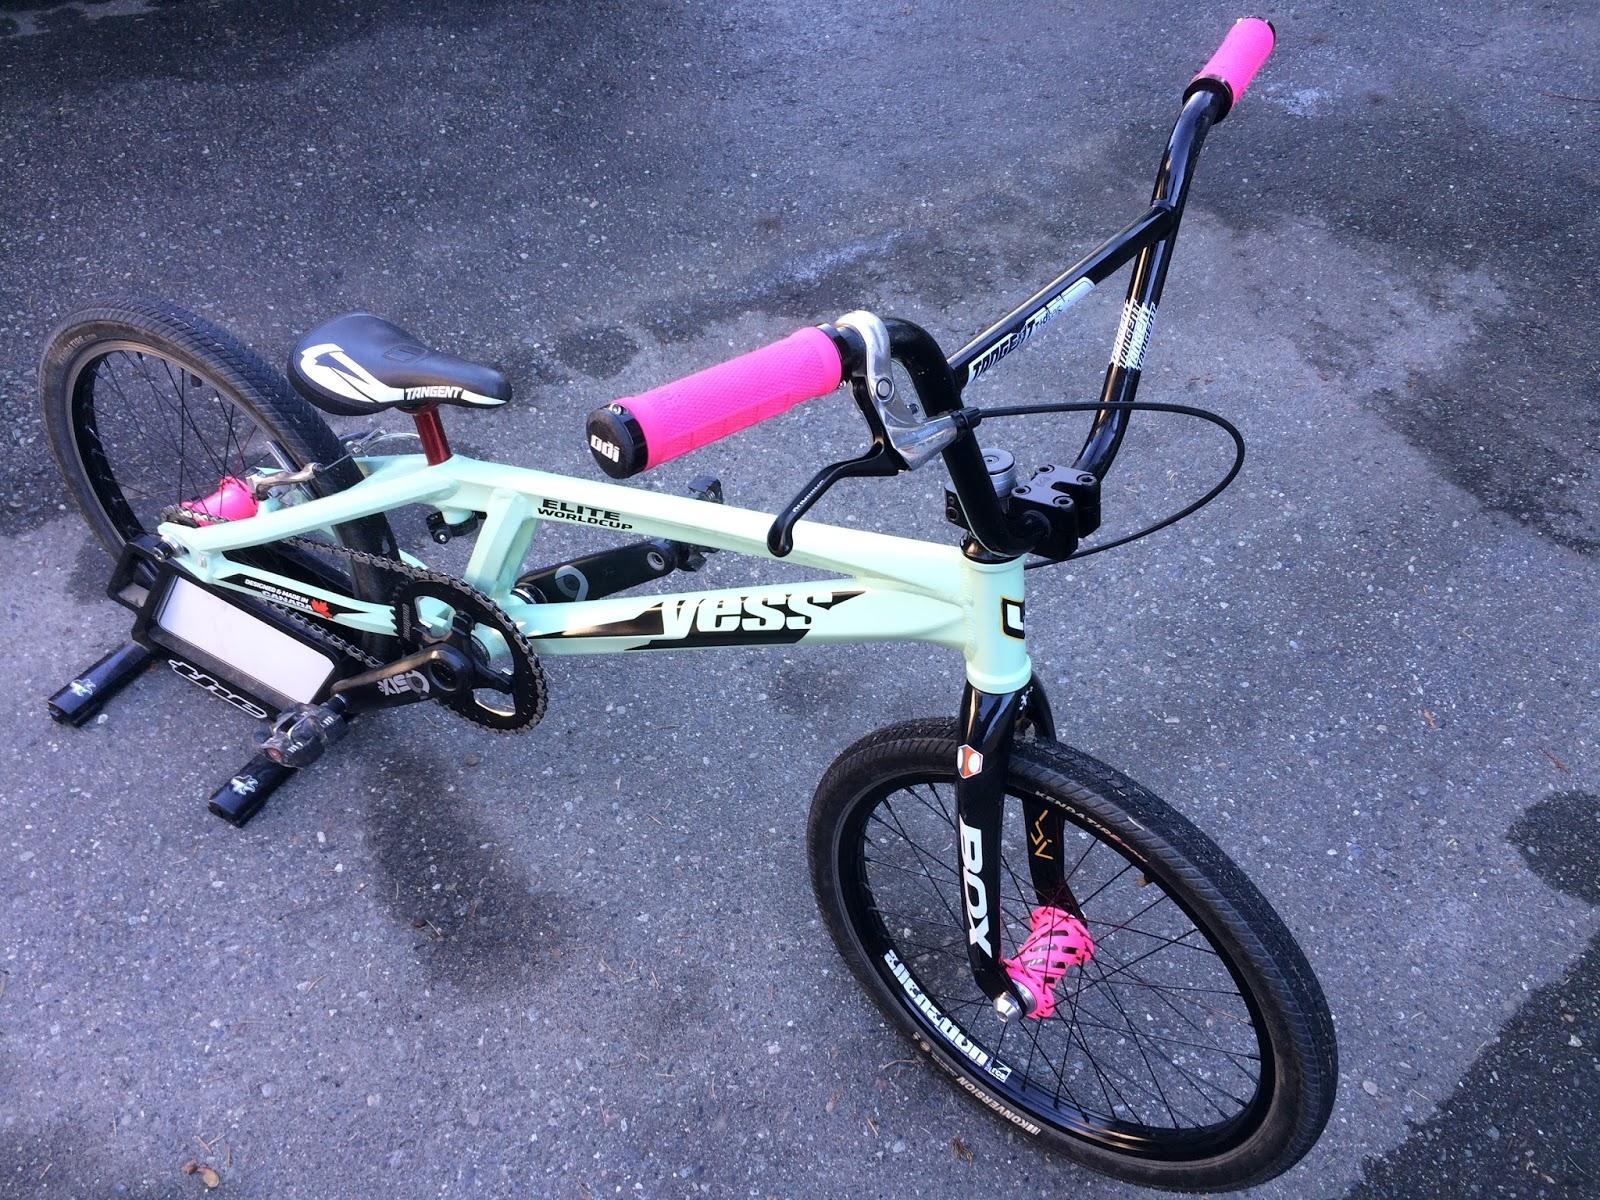 Drew Mechielson Bike Check | MAGNOLIA BMX